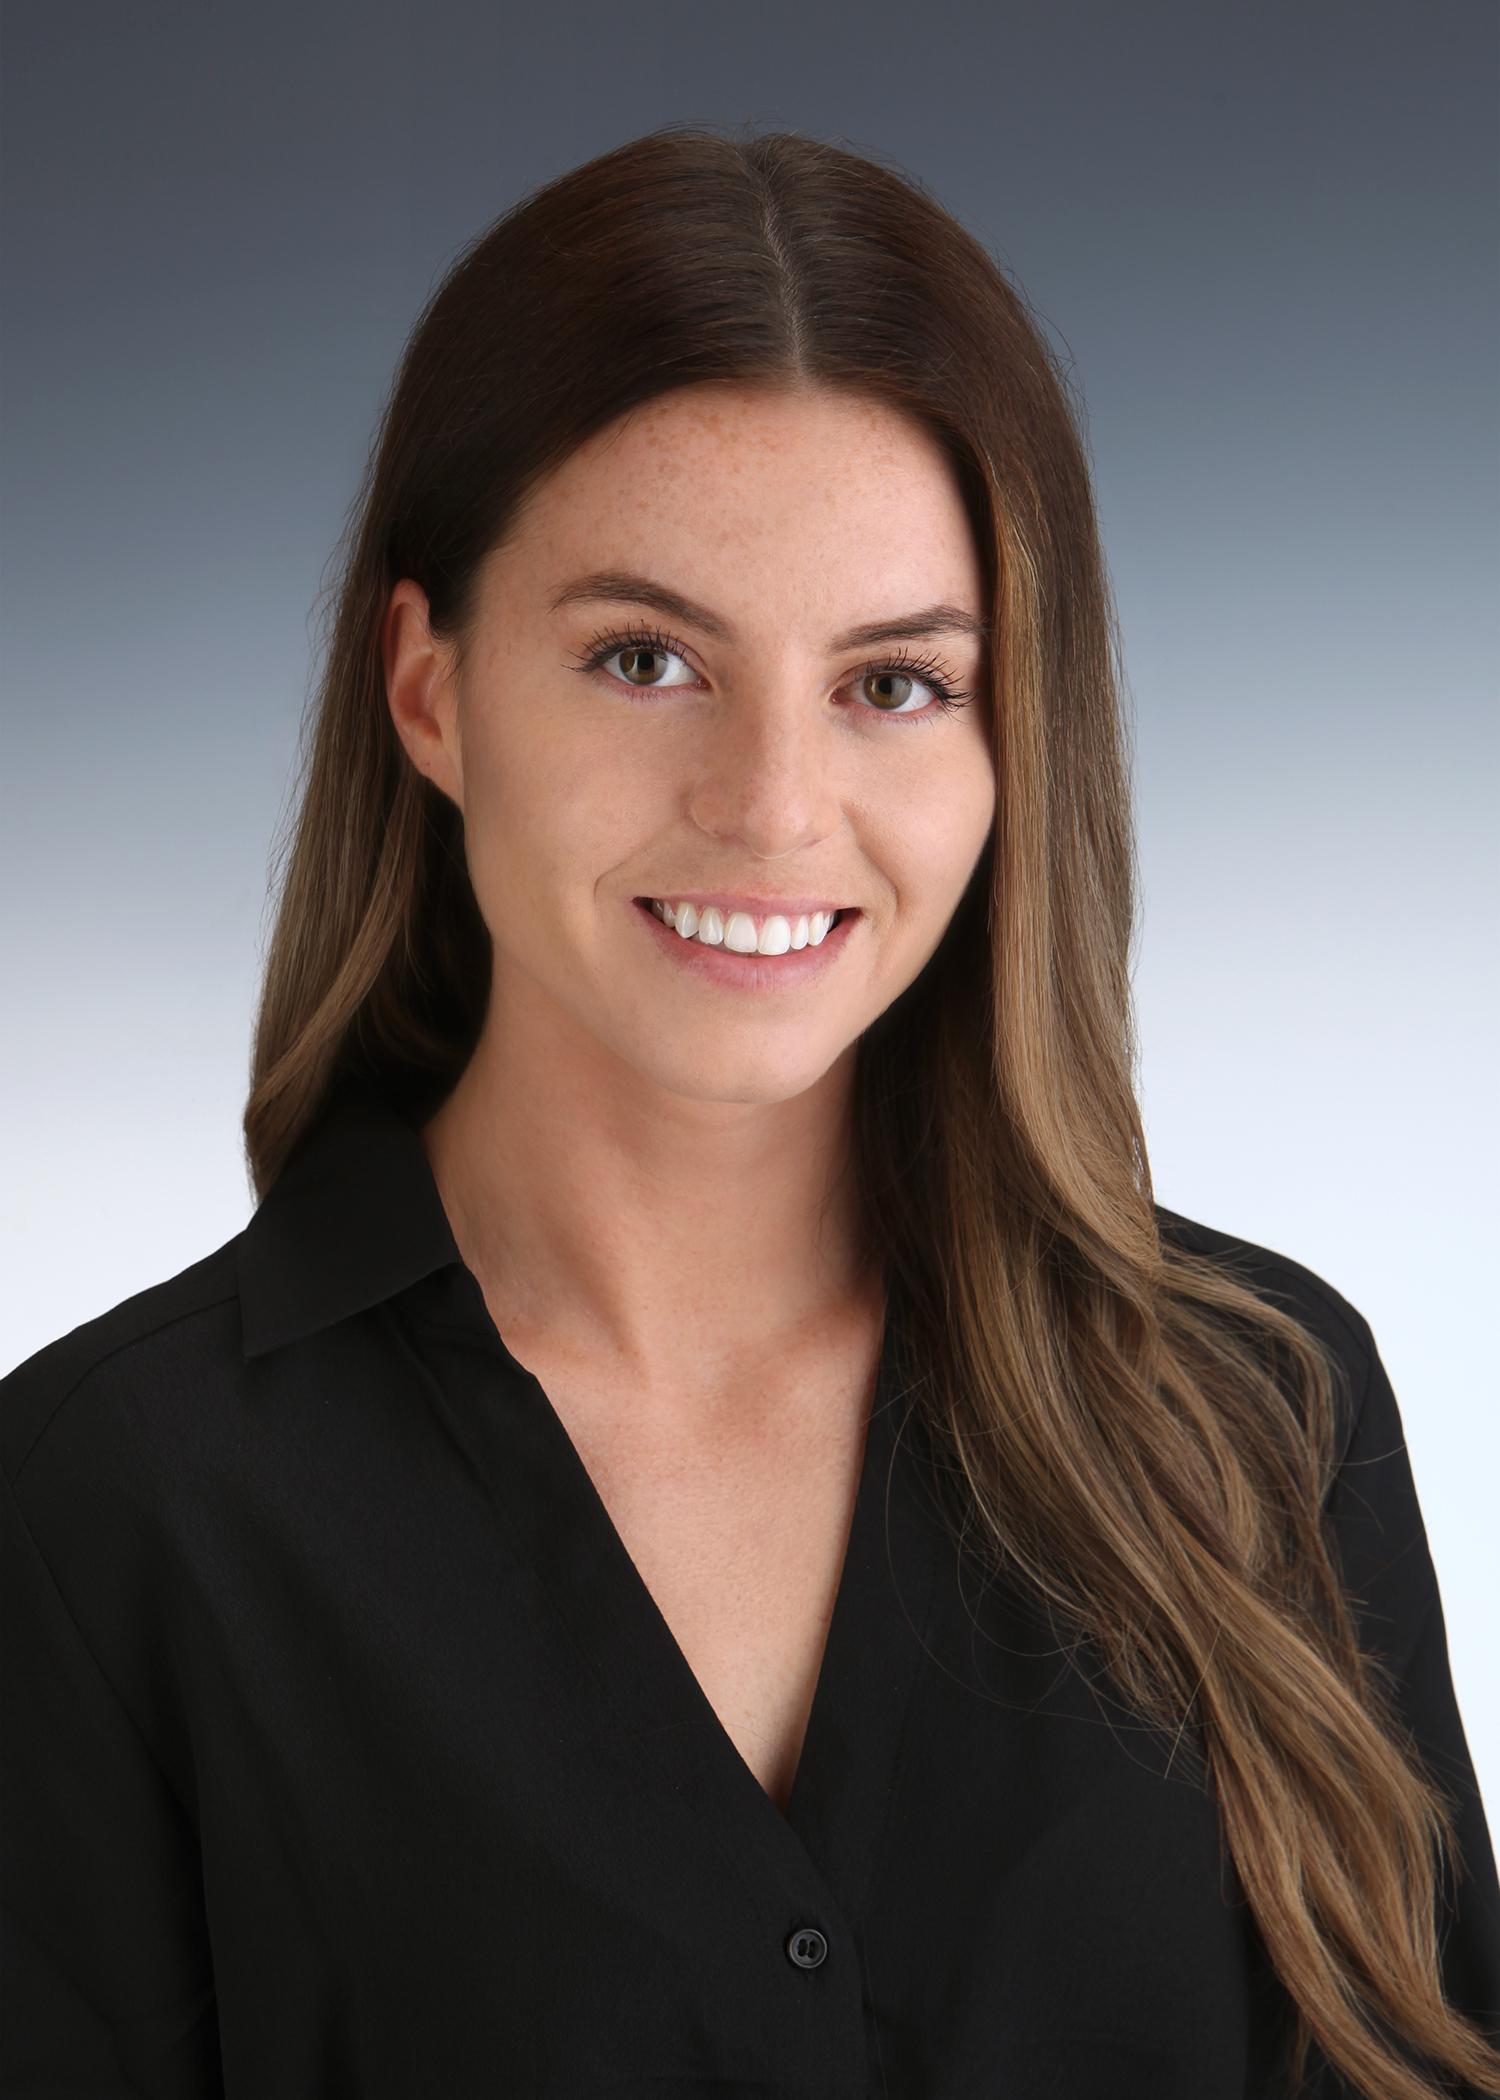 Alysha Kulka - Real Estate Marketing Manager for Sherwood Strickland